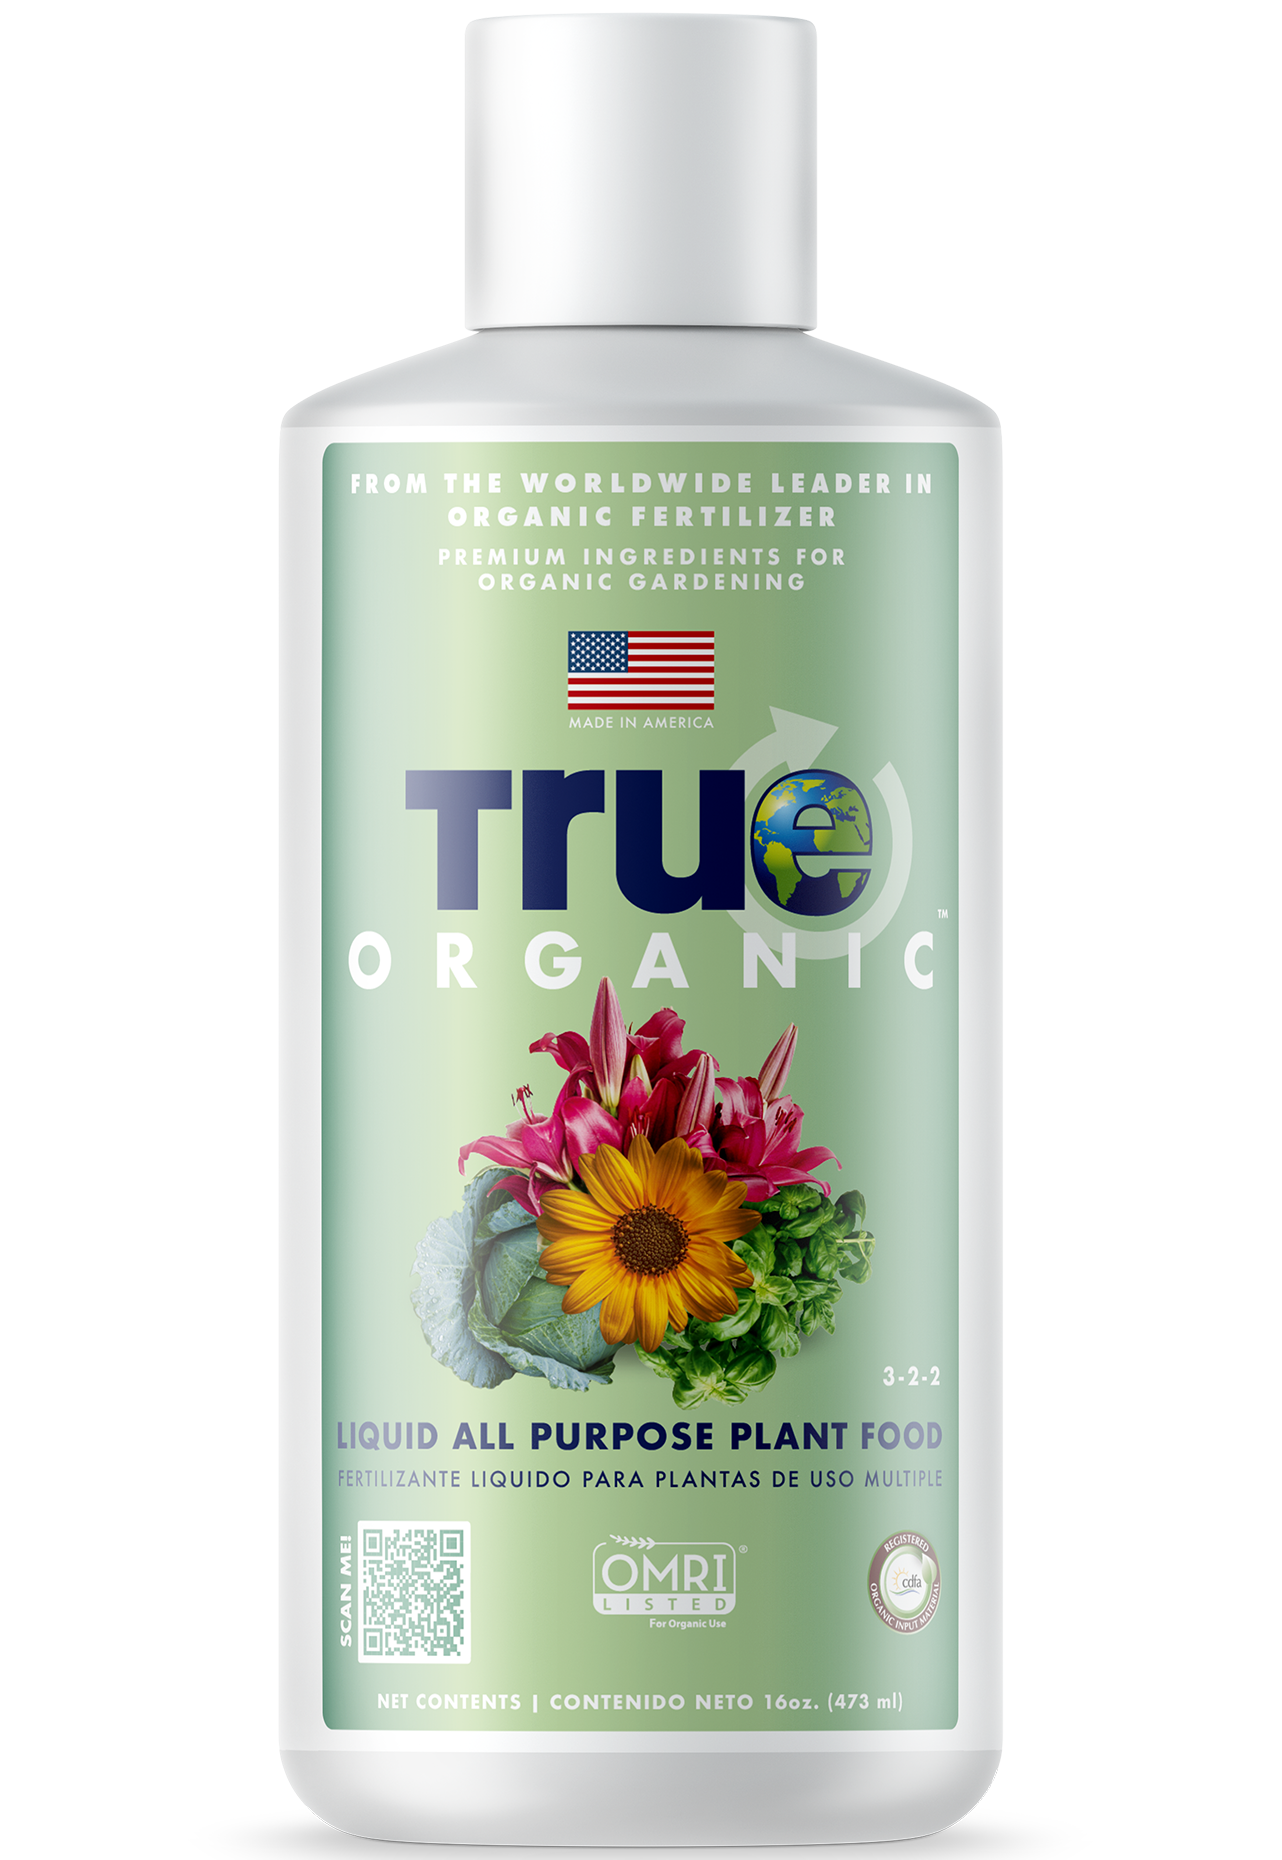 Bottle Of True Organic Liquid All Purpose Plant Food